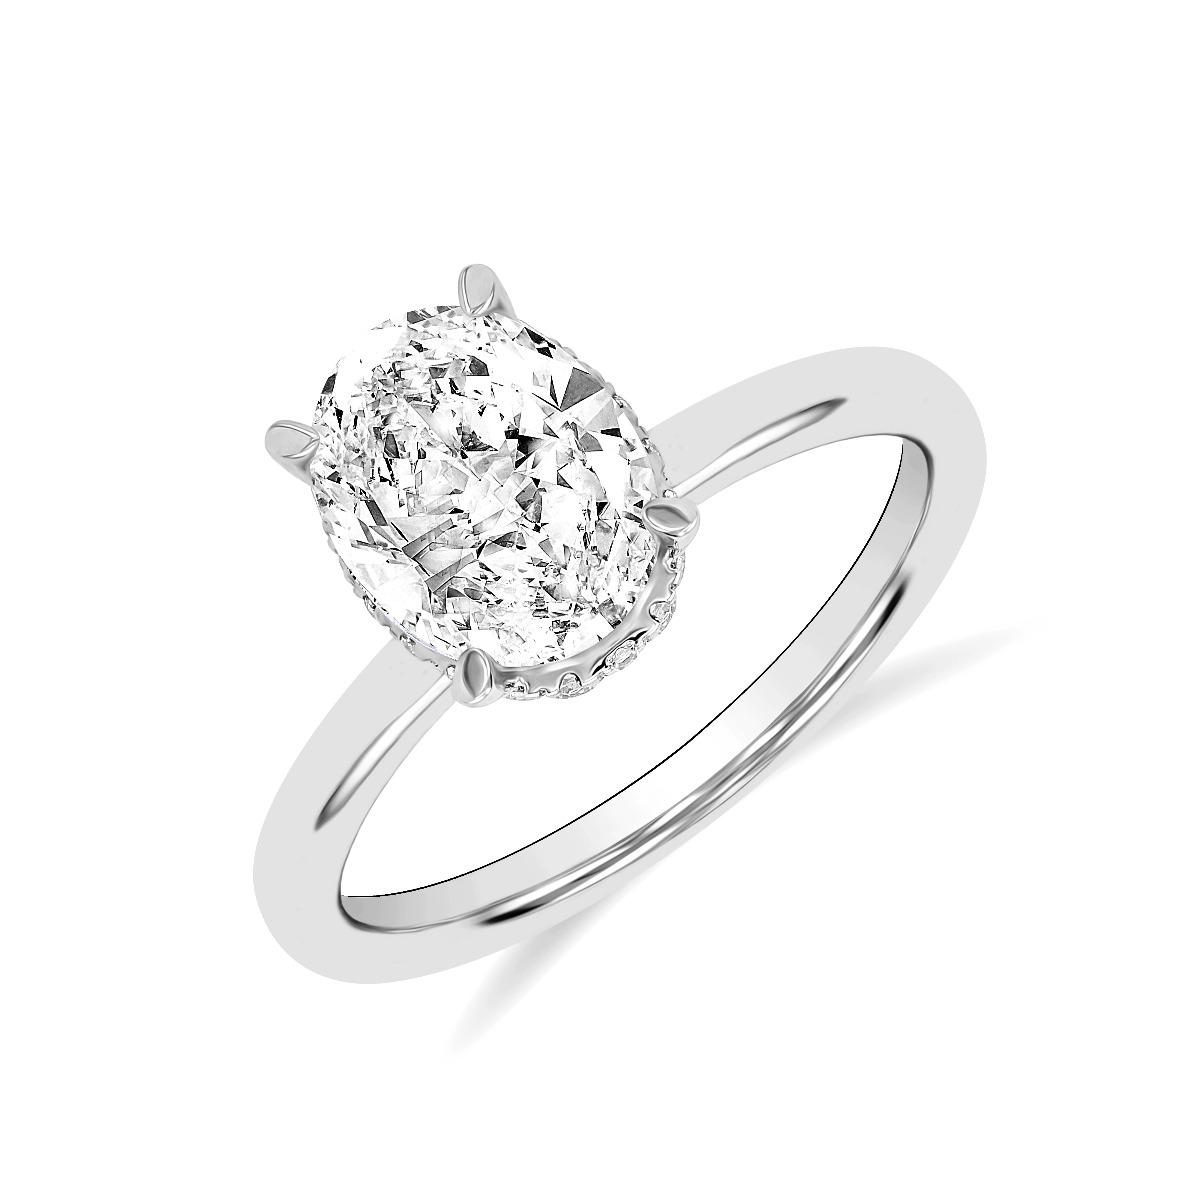 1.05ct Fleur Hidden Halo | Oval Solitaire Engagement Ring | Platinum